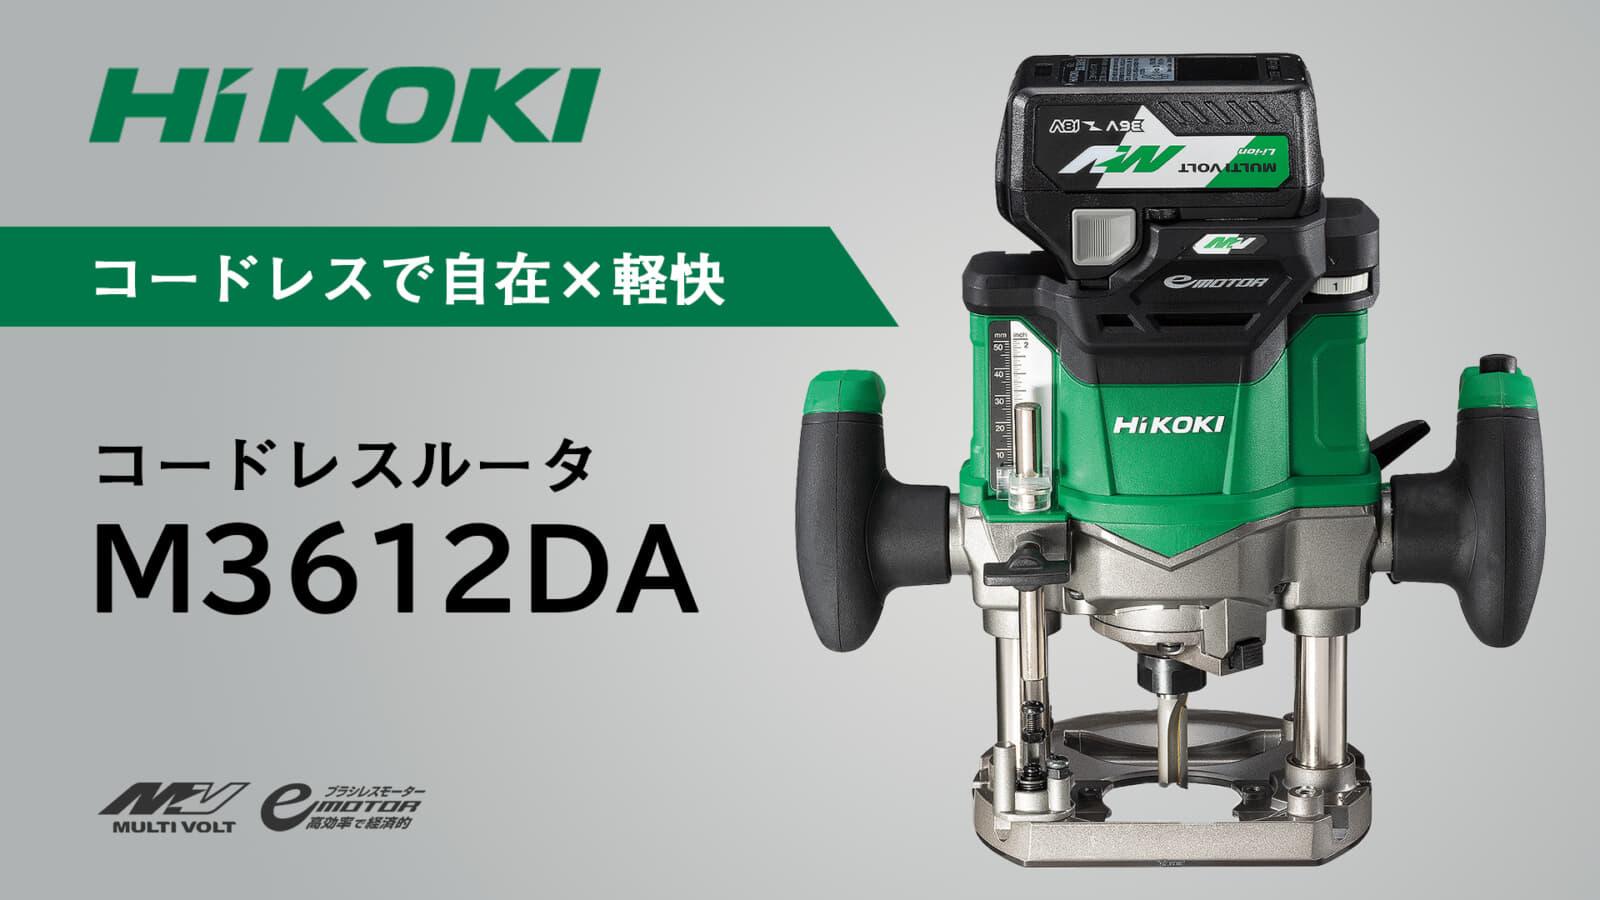 HiKOKI M3612DA コードレスルータを発売、業界初の充電式モデル